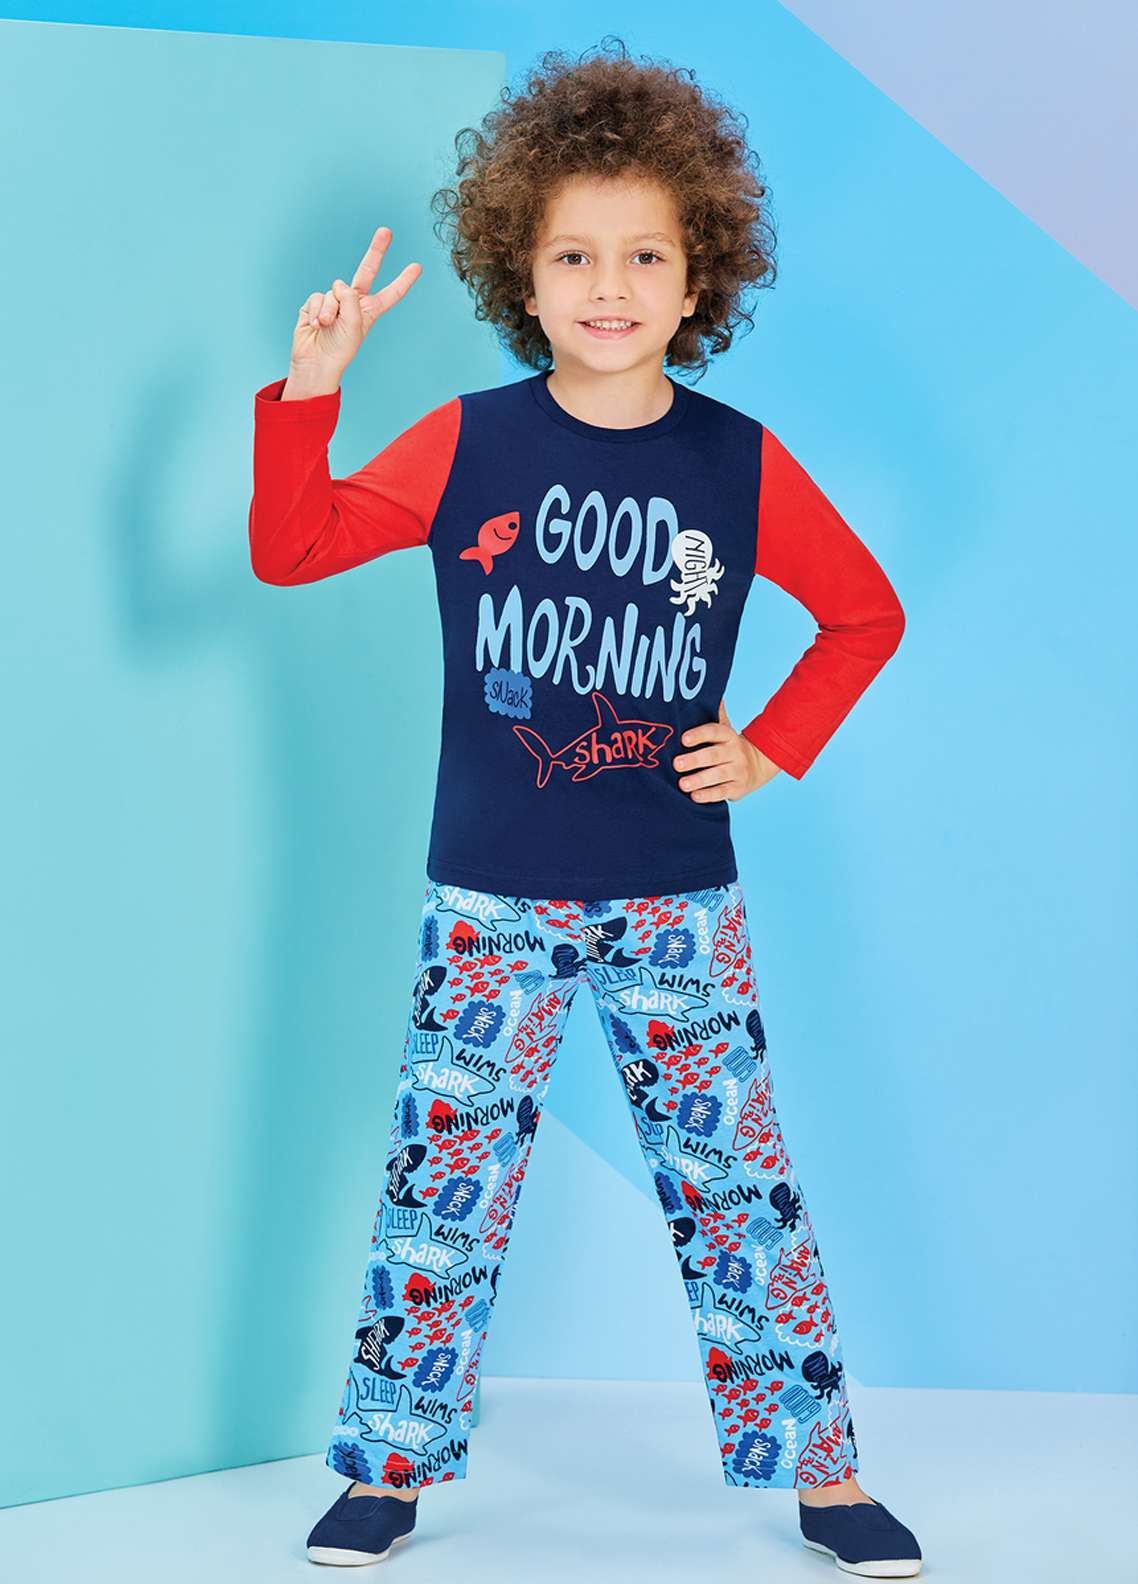 Cotton Net Kids Nightwear 2 Piece NS18K 1200 NAVY BLUE